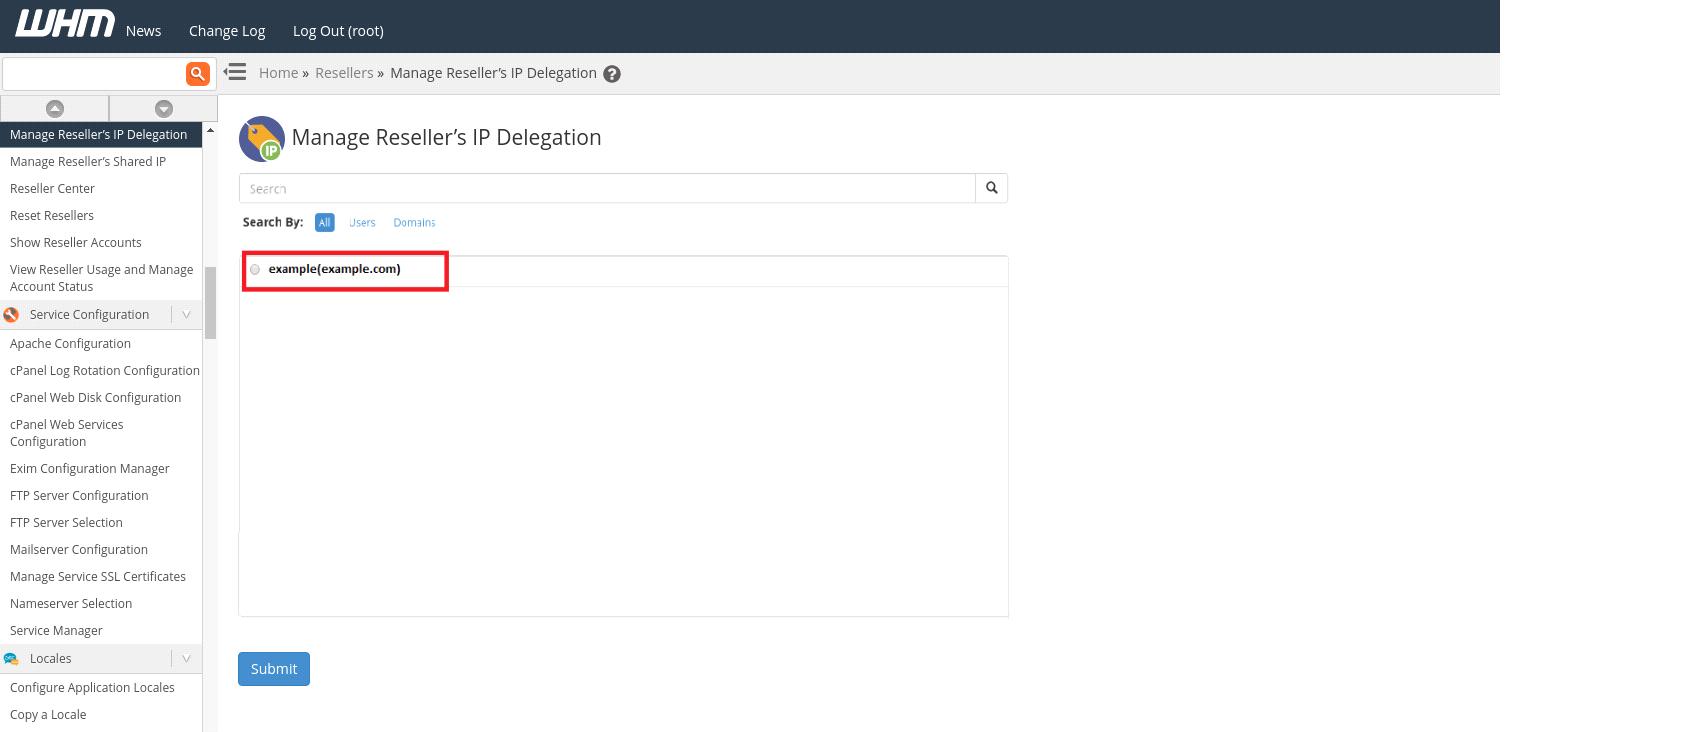 Manage Reseller's IP Delegation in cPanel - Interserver Tips